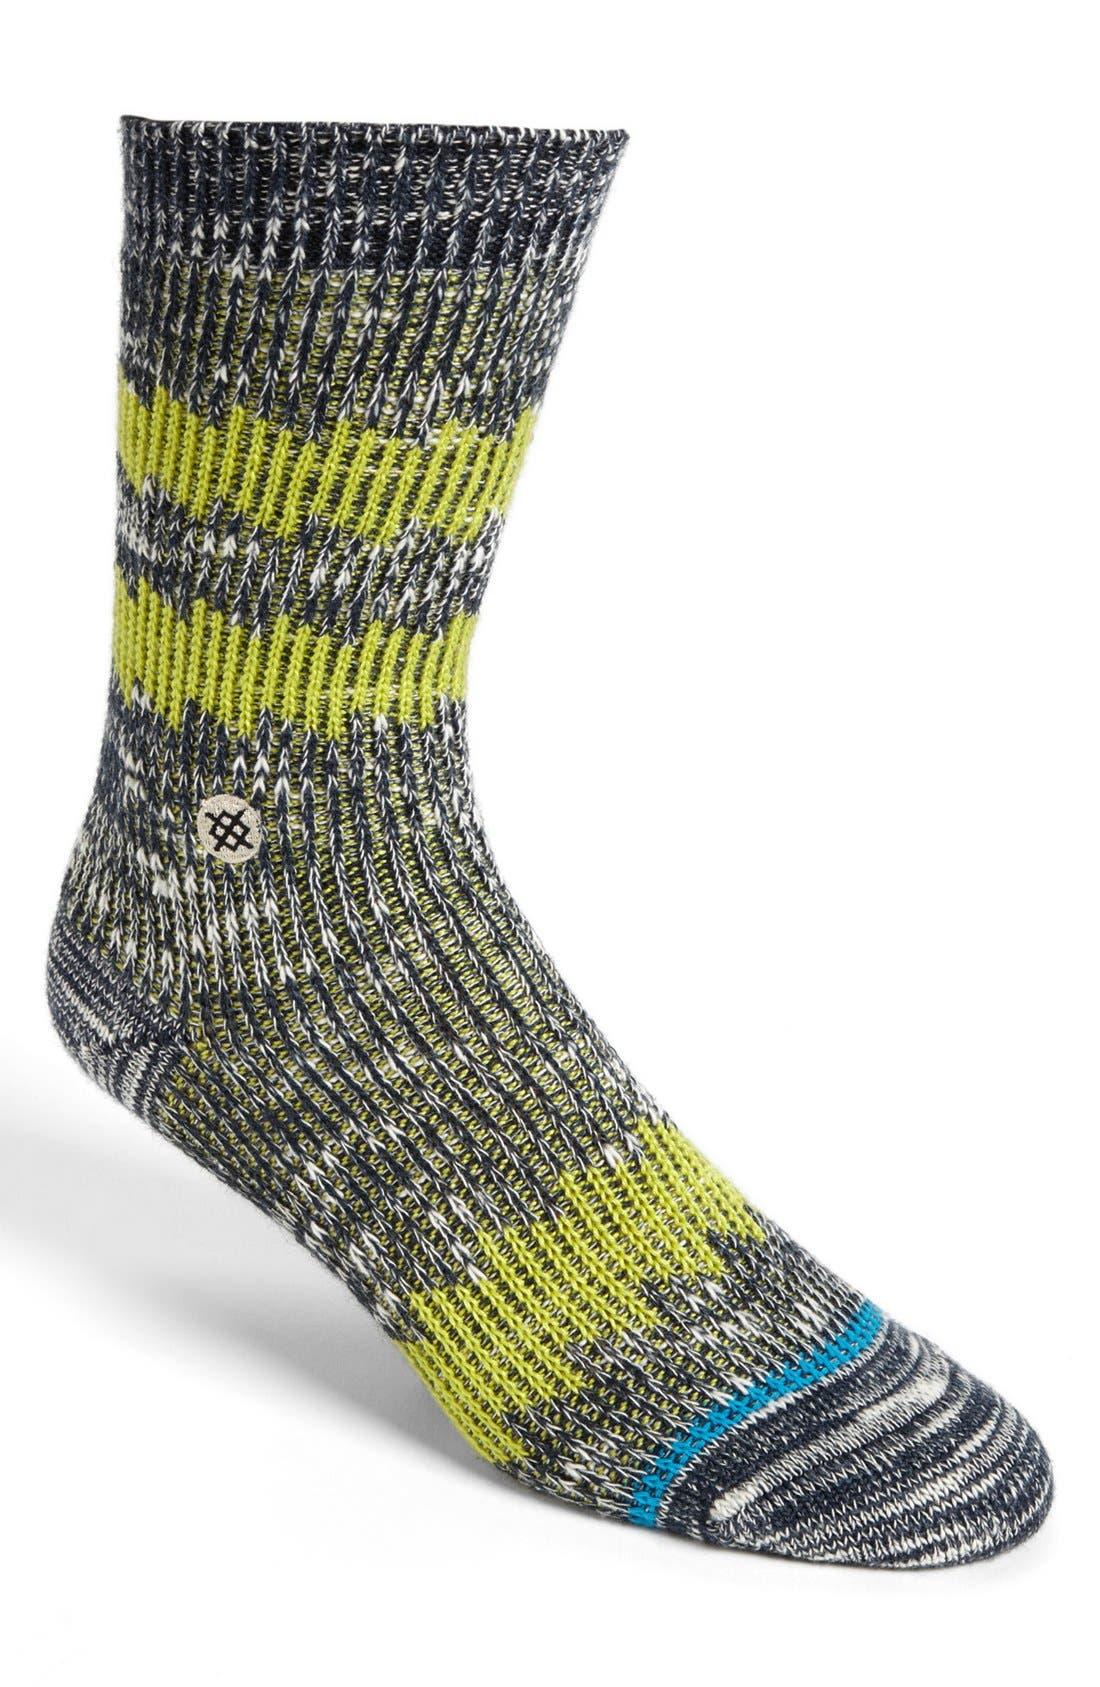 Main Image - Stance 'Sawtooth' Socks